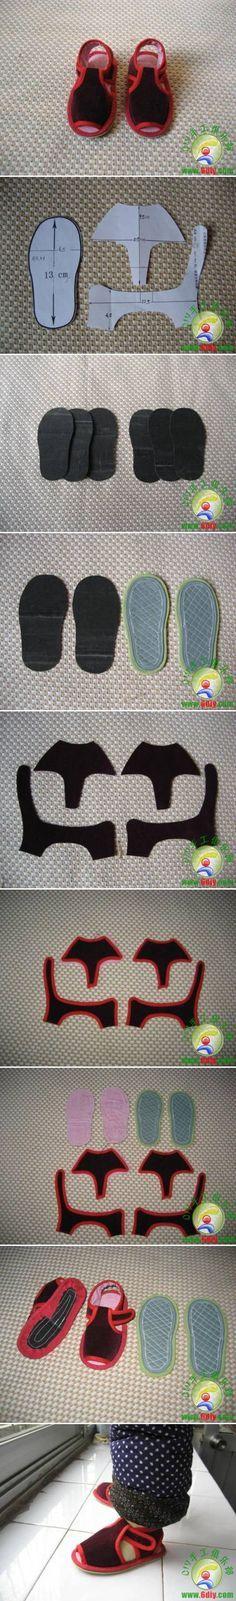 DIY Sew Baby Sandal